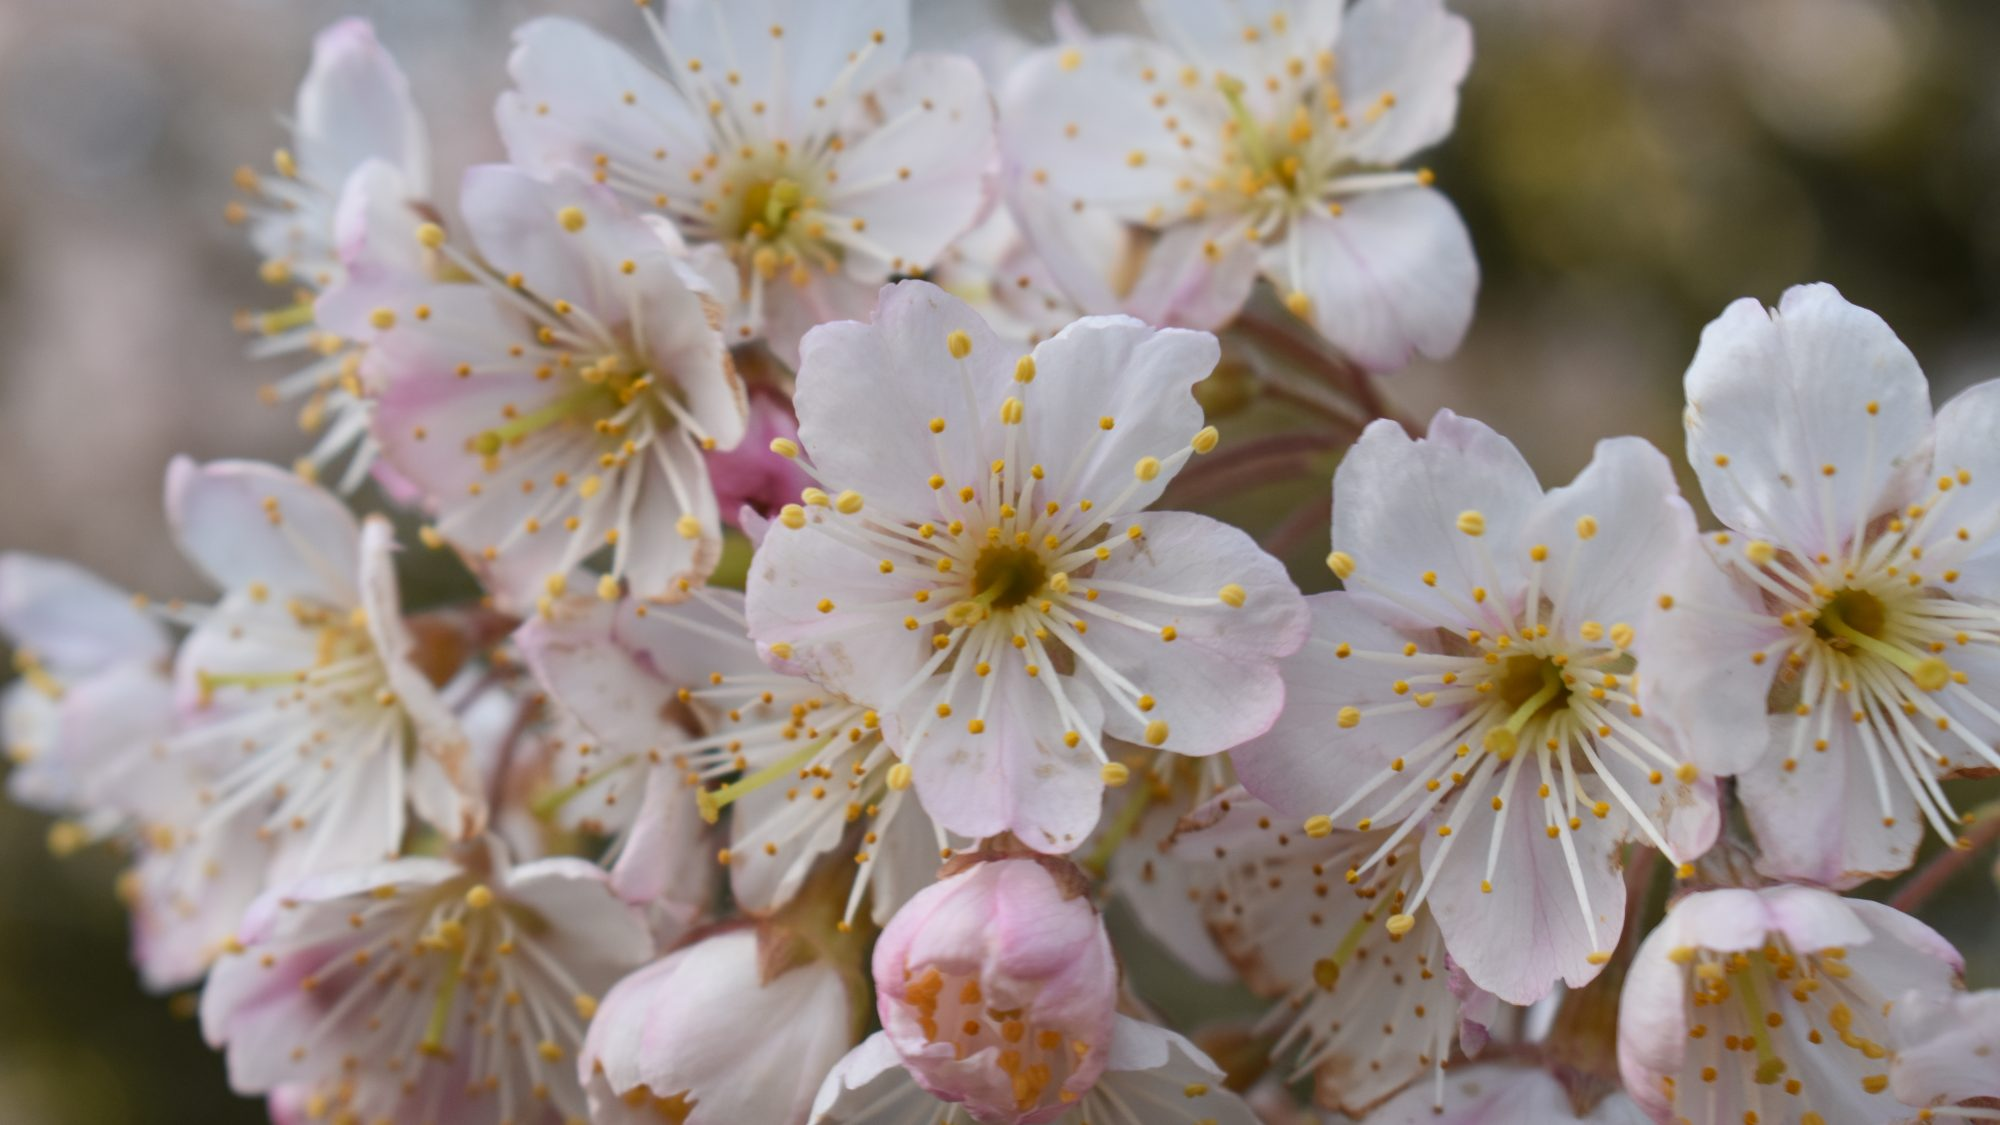 Prunus pseudocerasus var. cantabrigiensis